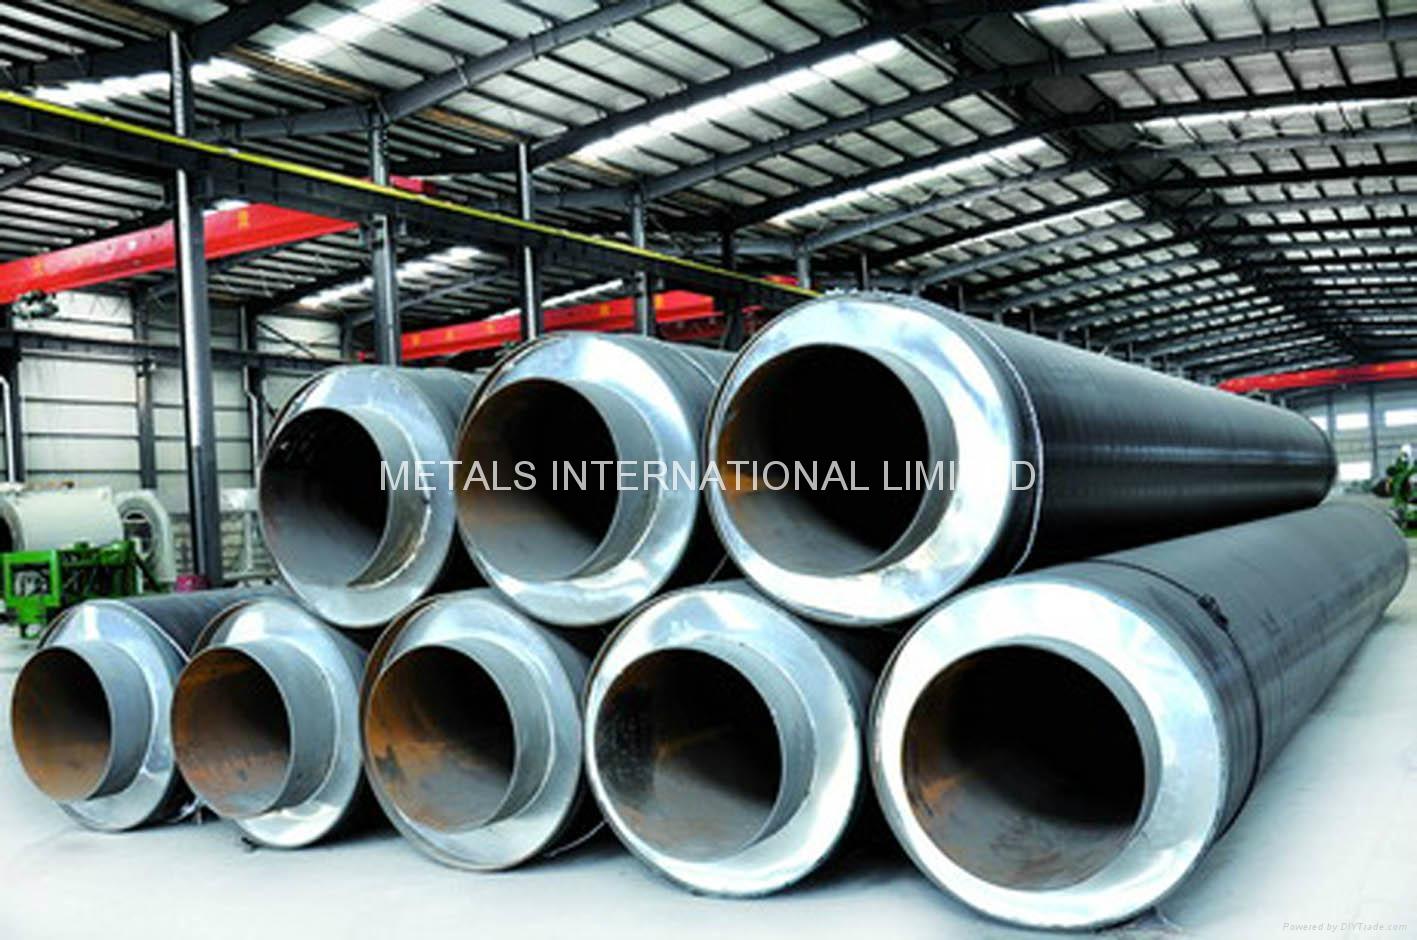 Awwa C205 Knpc 87c1 Din 30673 Cement Bitumen Epoxy Zinc